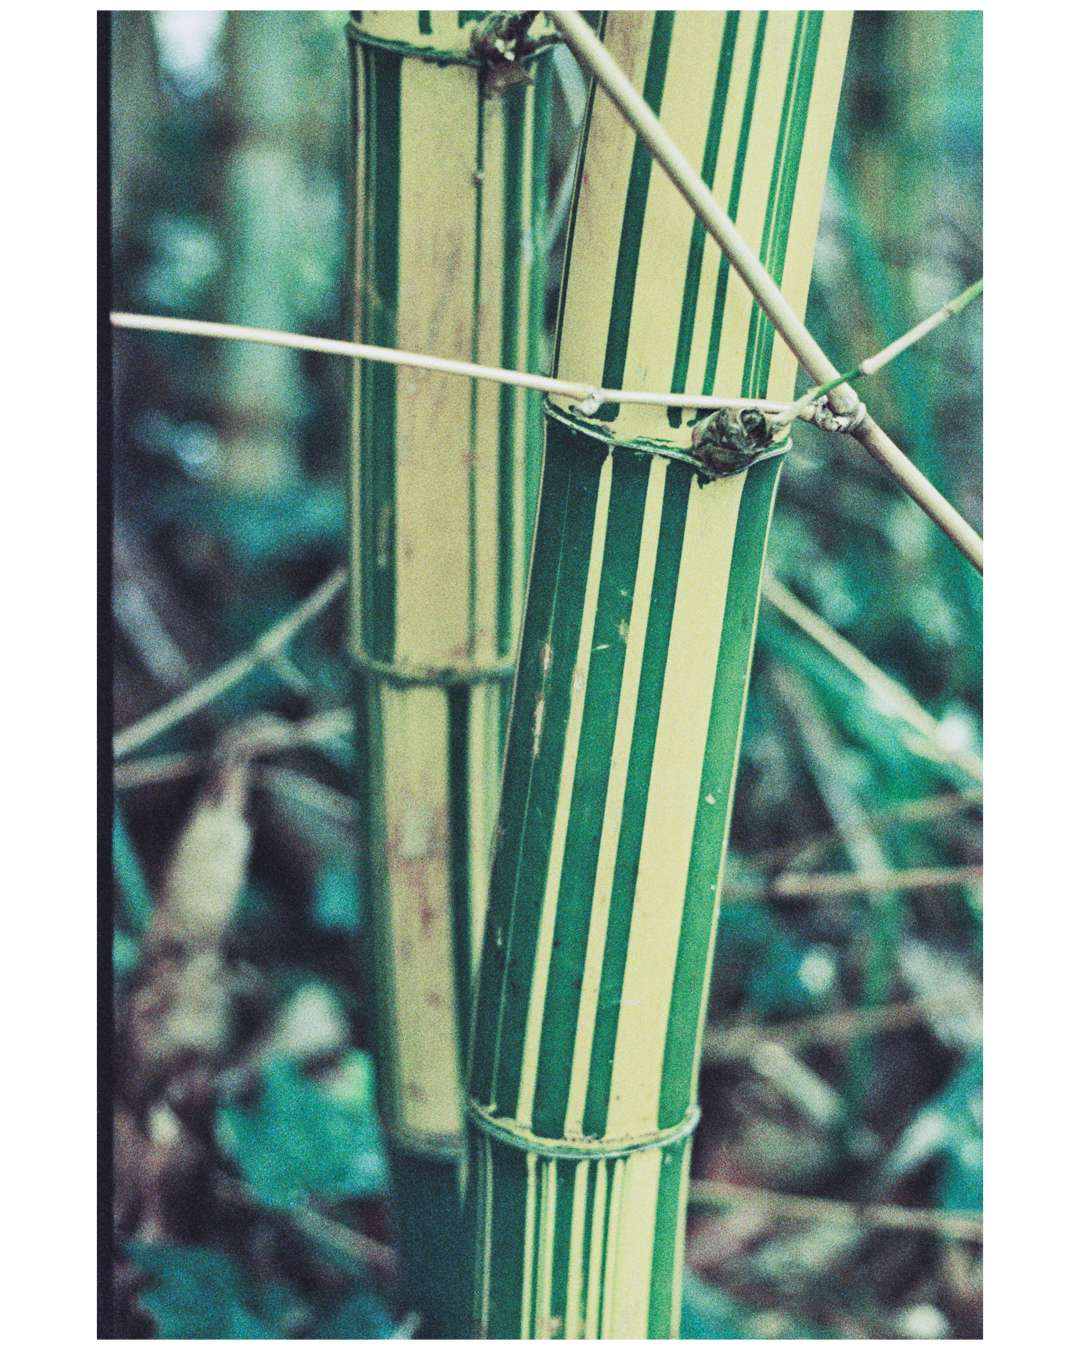 Film Photography Photo Walk 35mm - South Africa - by Ken Treloar Photography-6.jpg